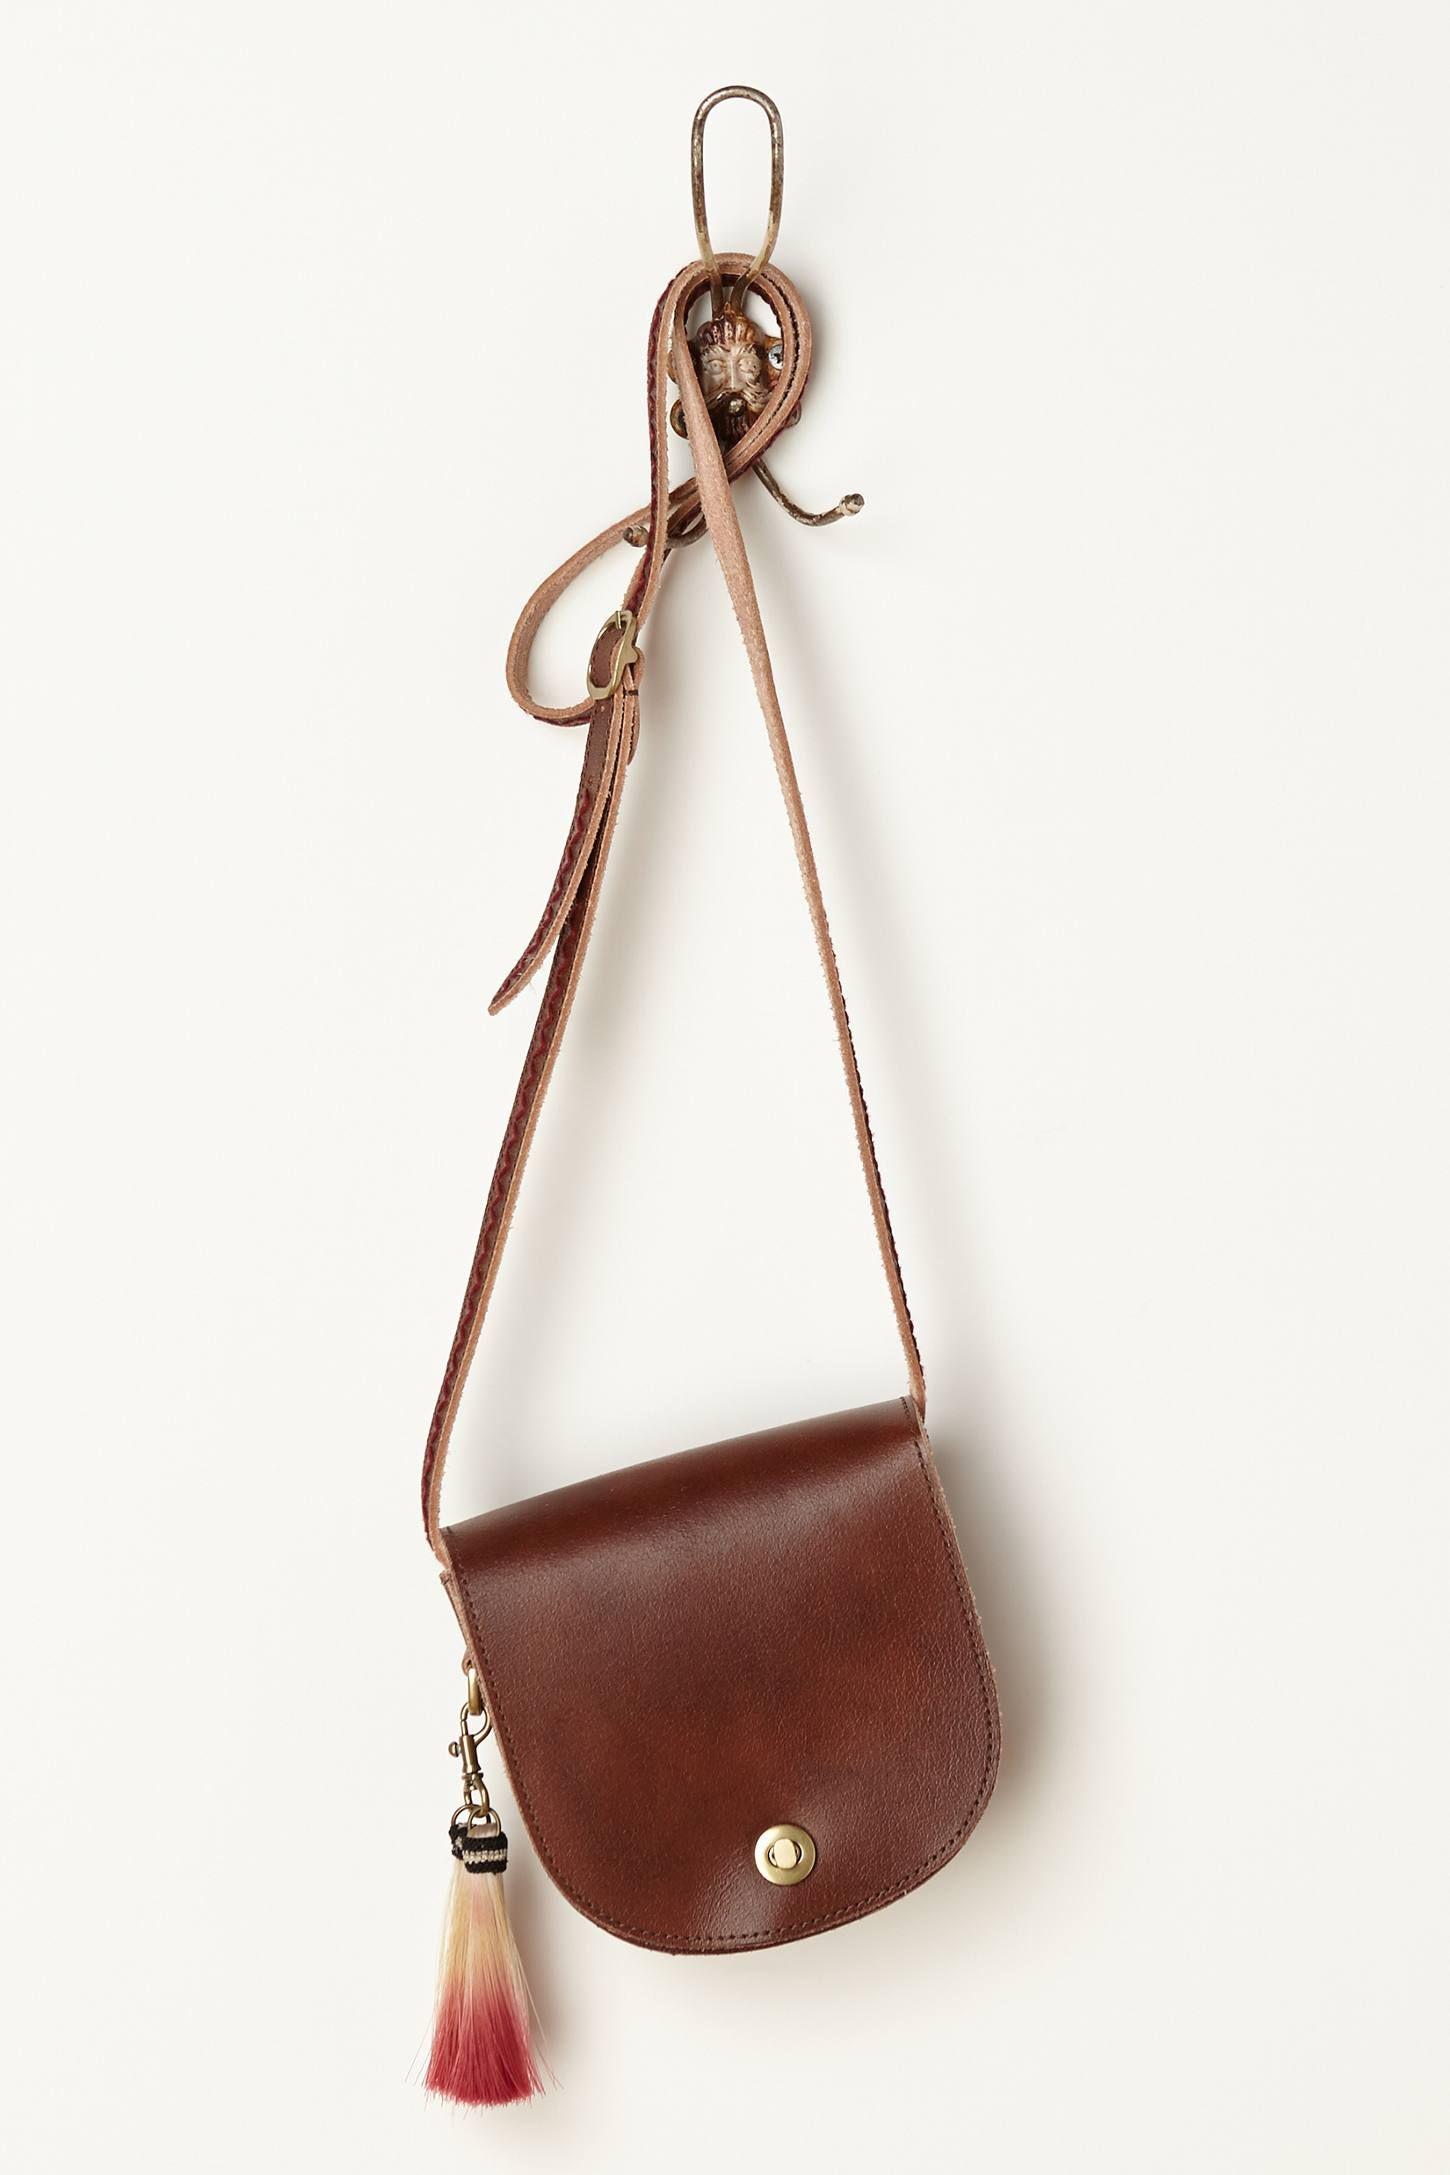 Pizzicato Mini Crossbody Bag - anthropologie.com